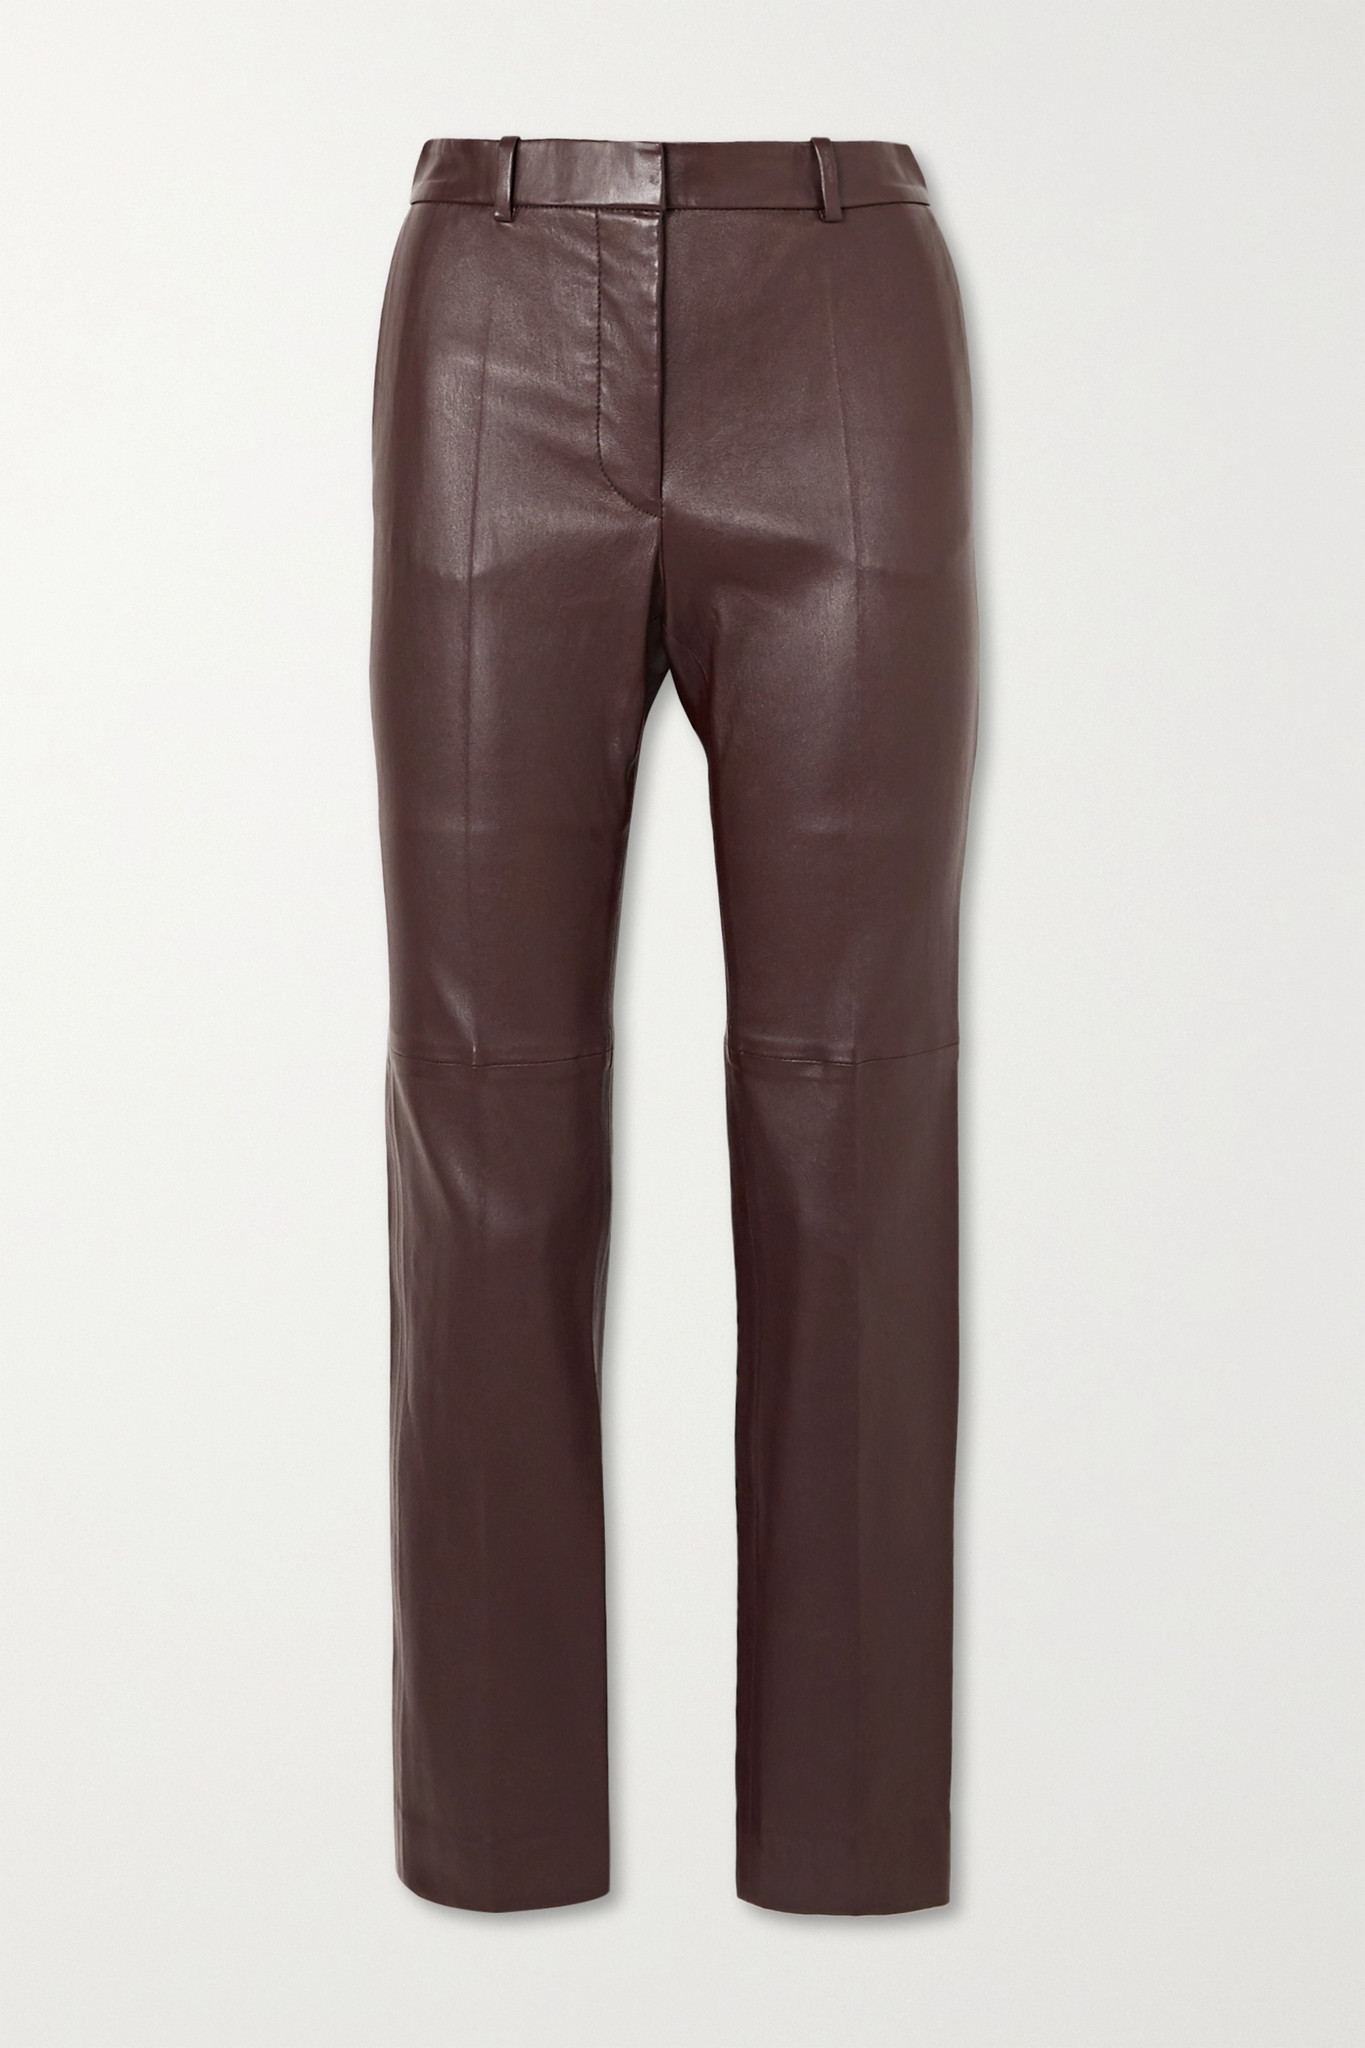 JOSEPH - Coleman Leather Slim-leg Pants - Burgundy - FR36